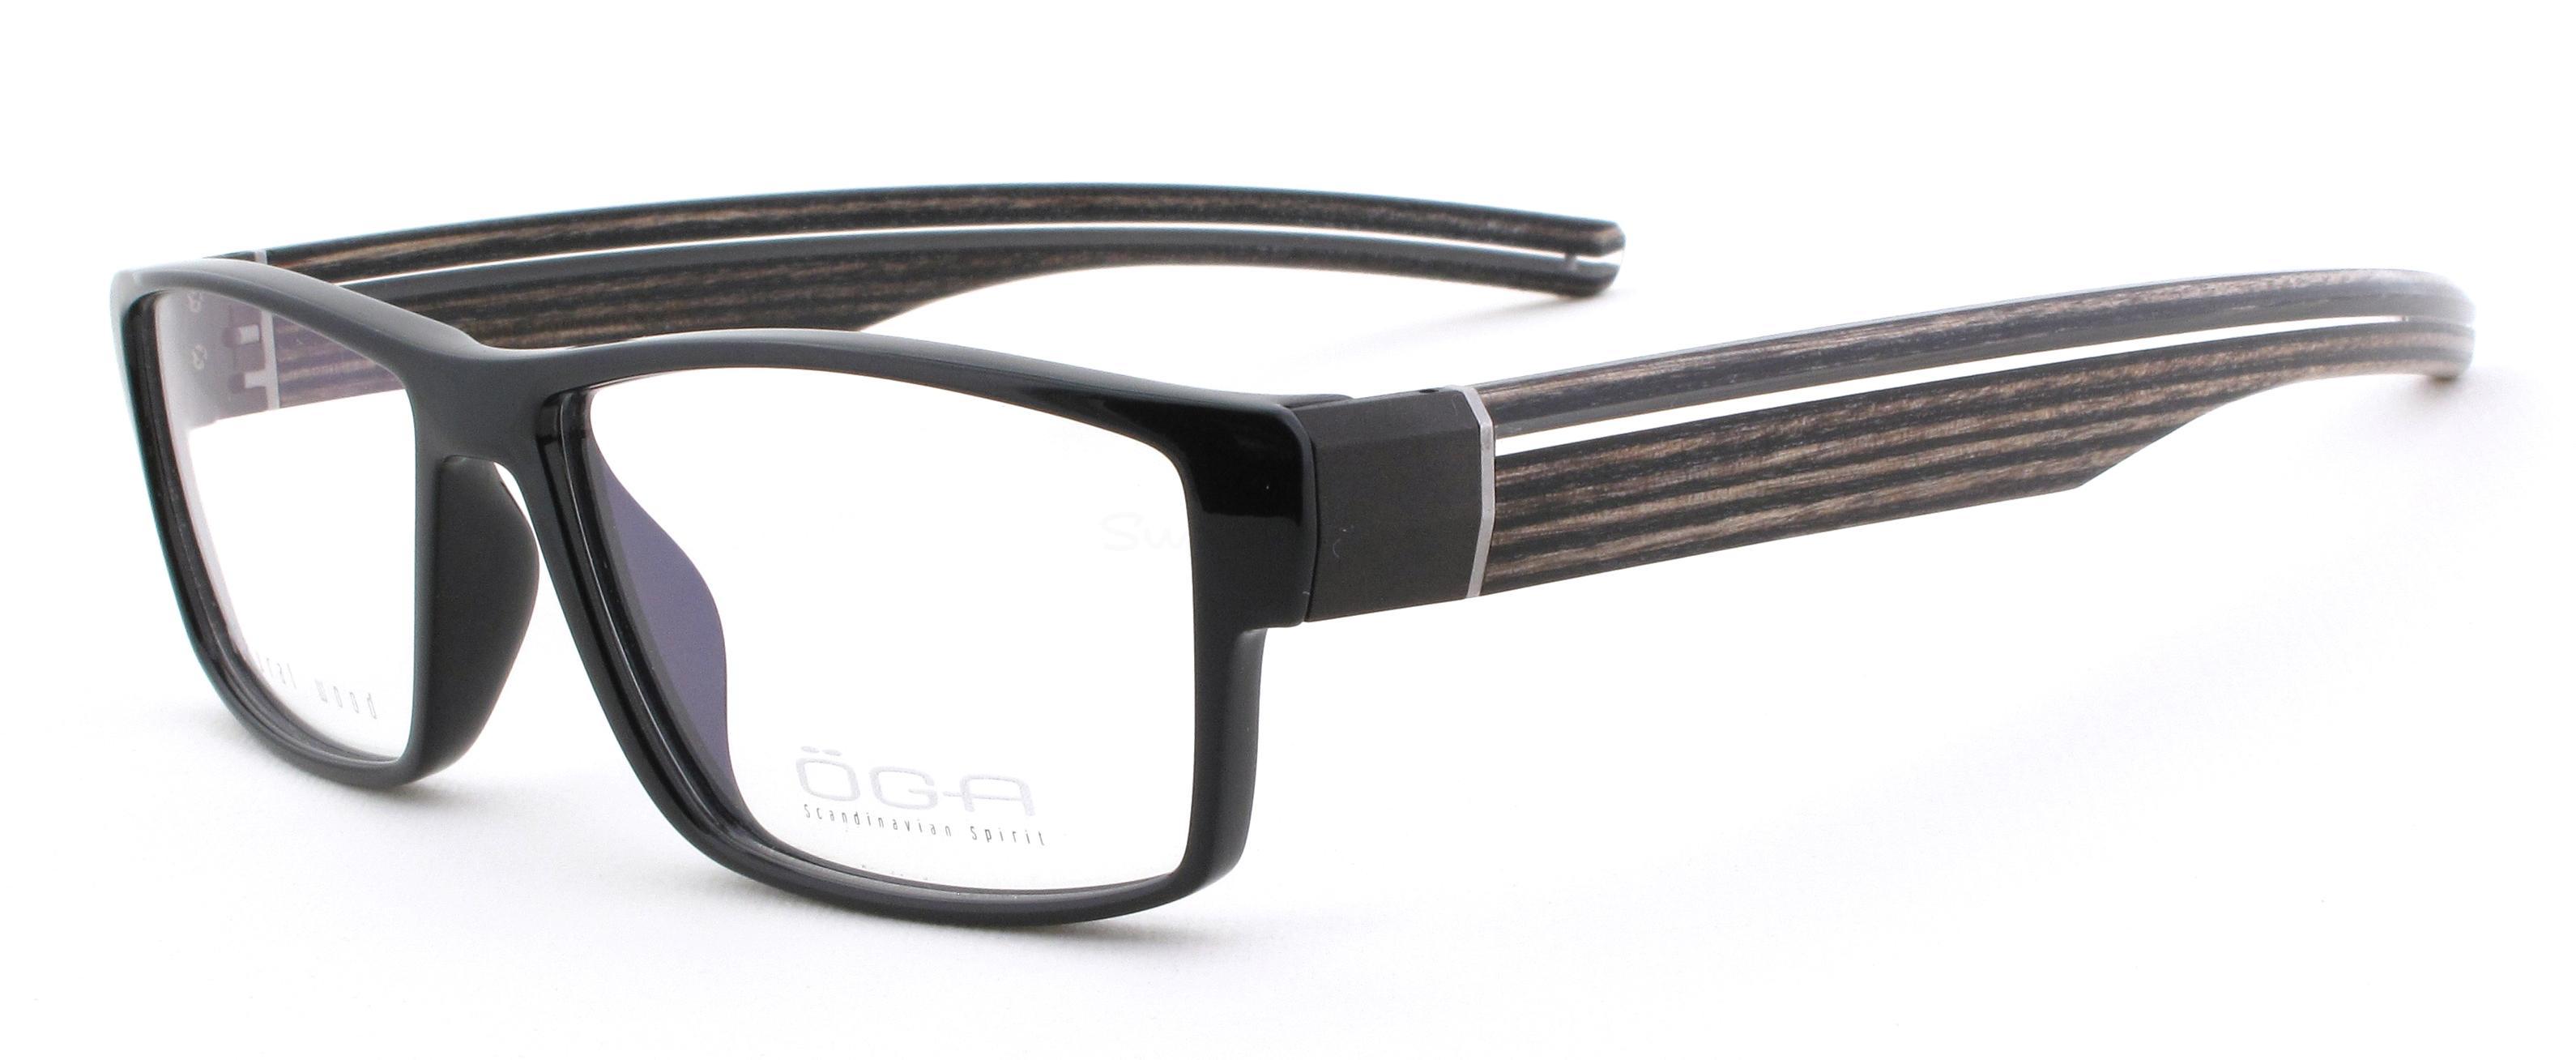 NG020 7300O GLASTRA Glasses, ÖGA Scandinavian Spirit